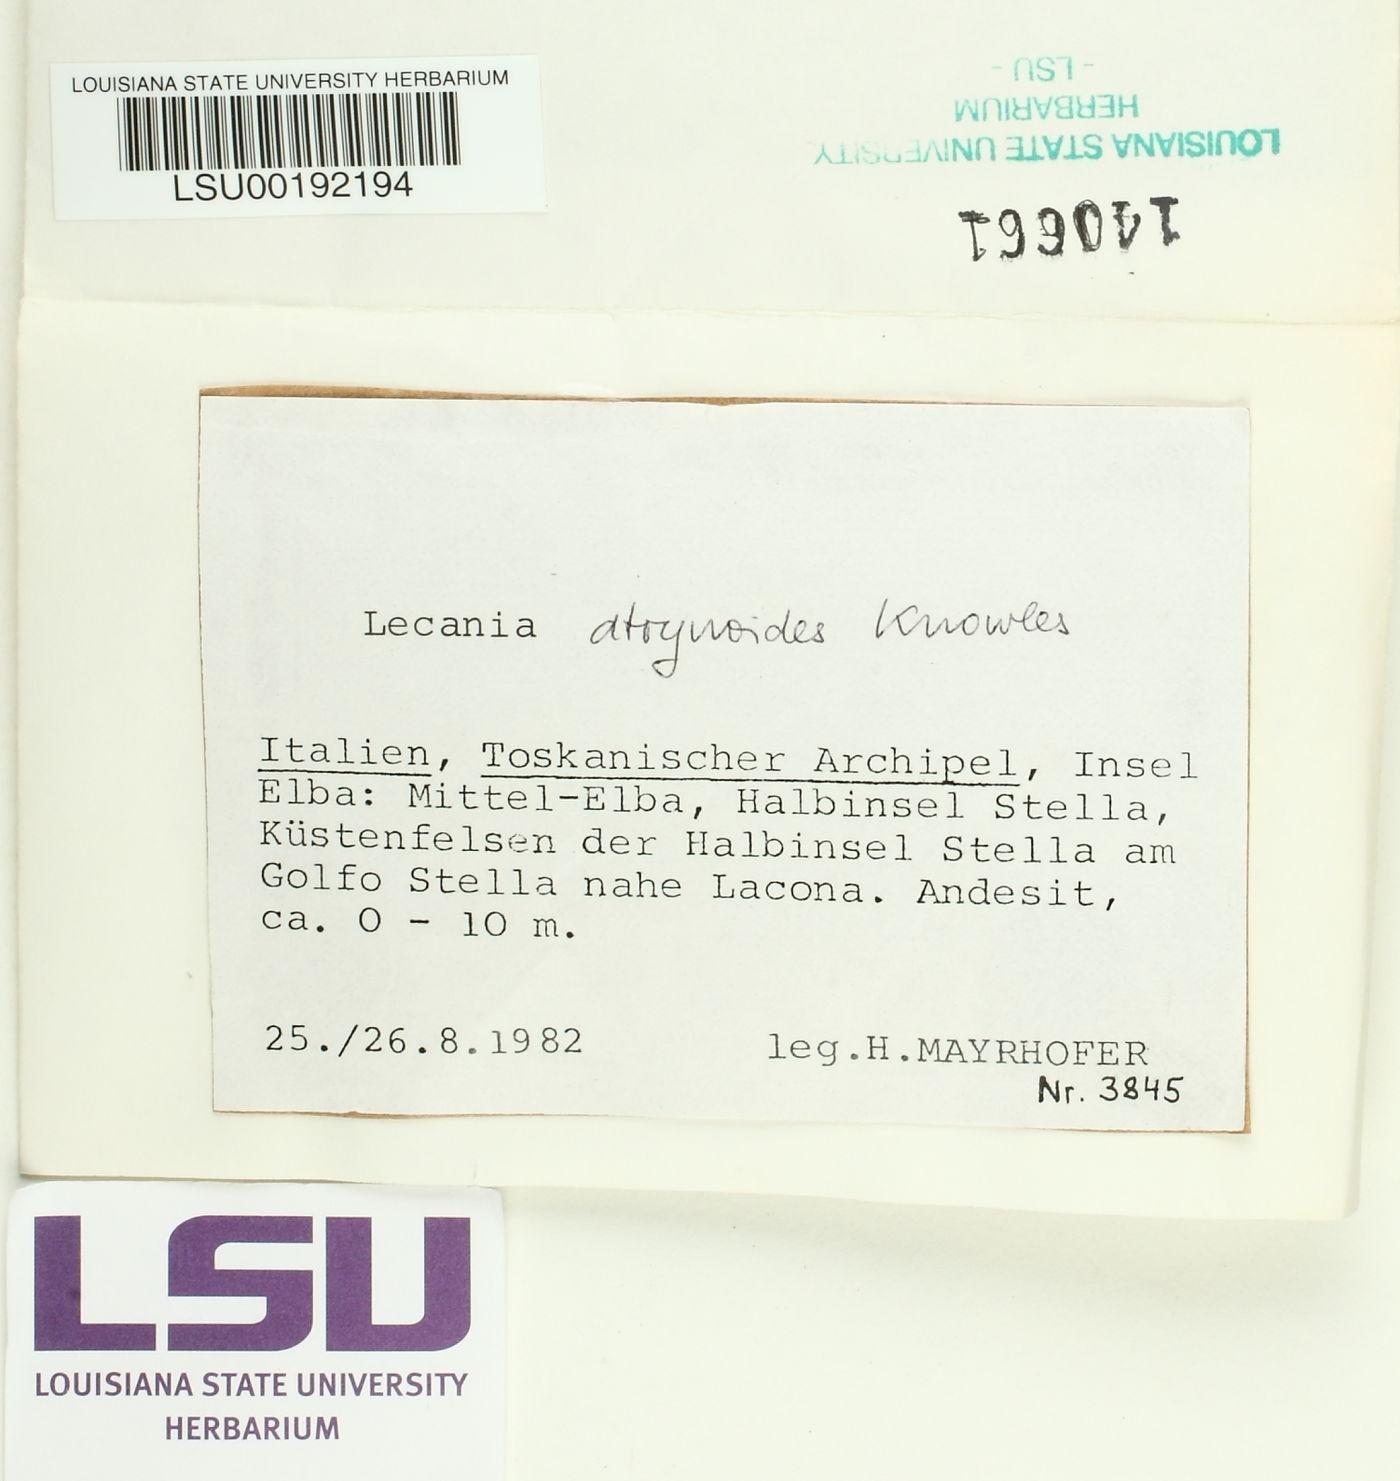 Lecania atrynoides image